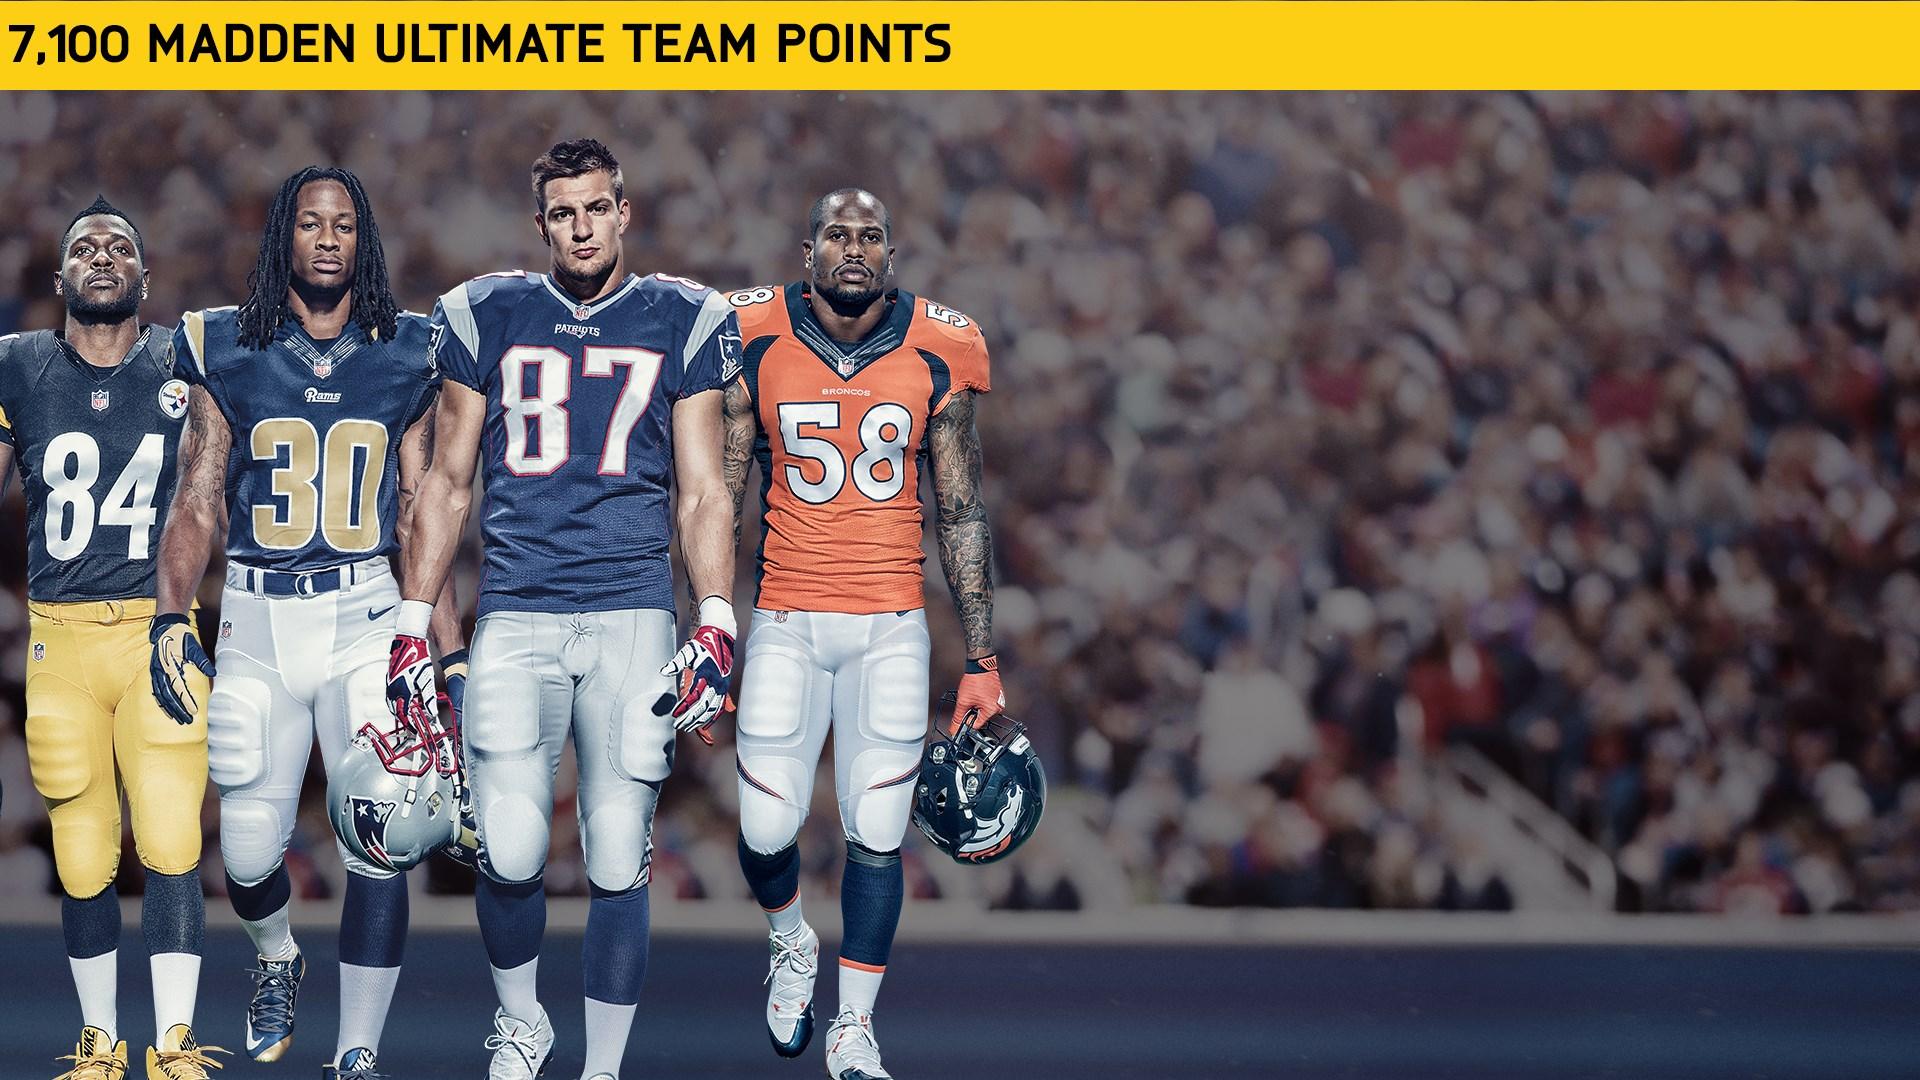 7100 Madden NFL 17 Points